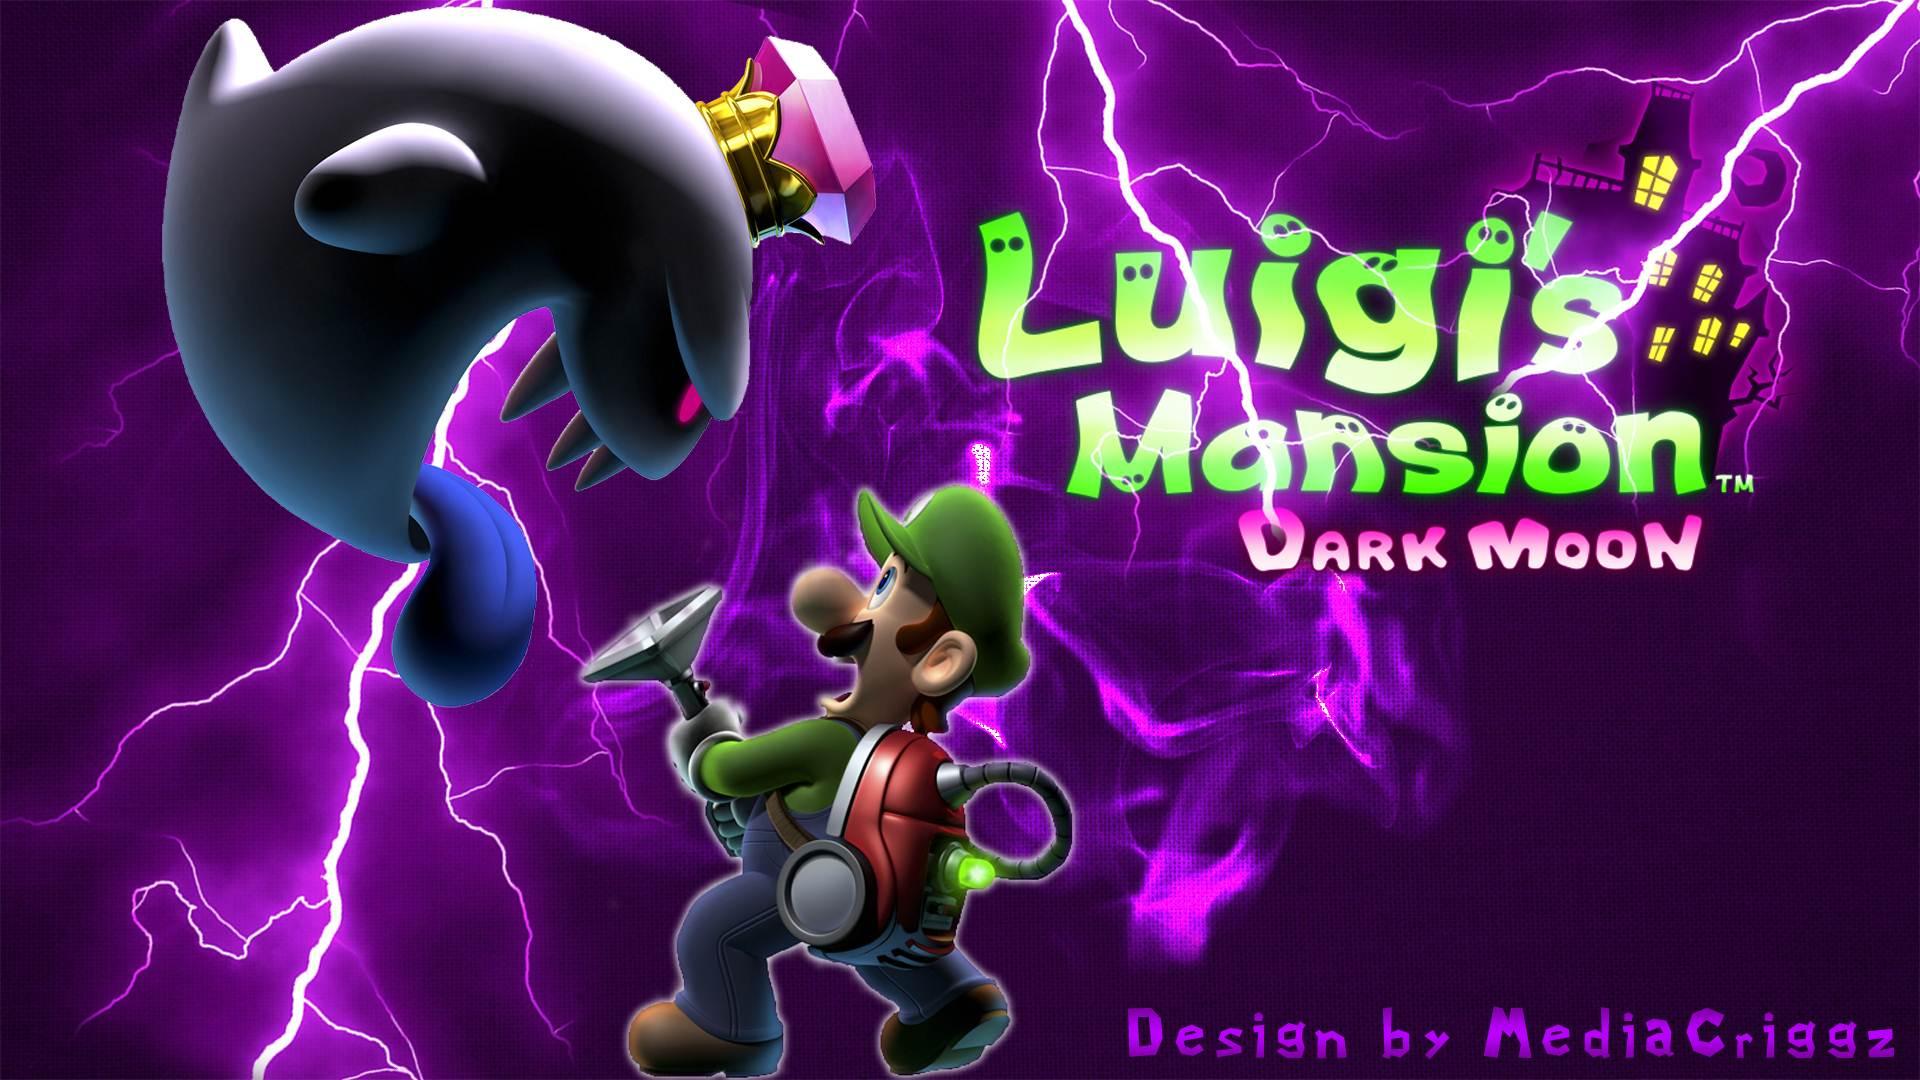 Dark Images Wallpaper Hd Luigis Mansion Dark Moon Wallpaper